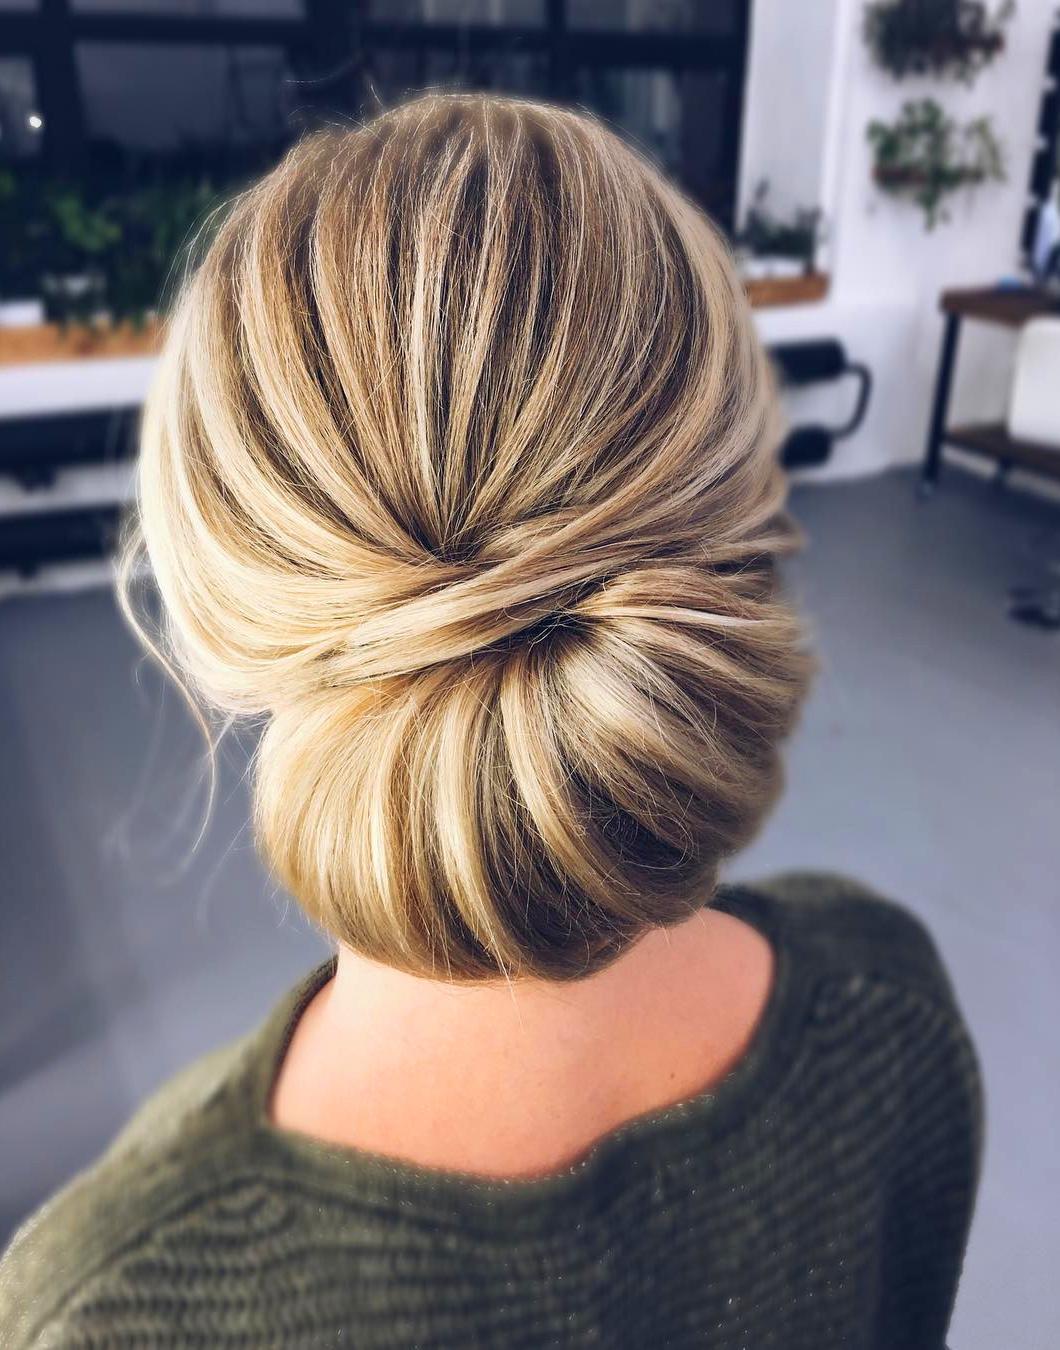 65 Captivating Wedding Hairstyles For Medium Length Hair